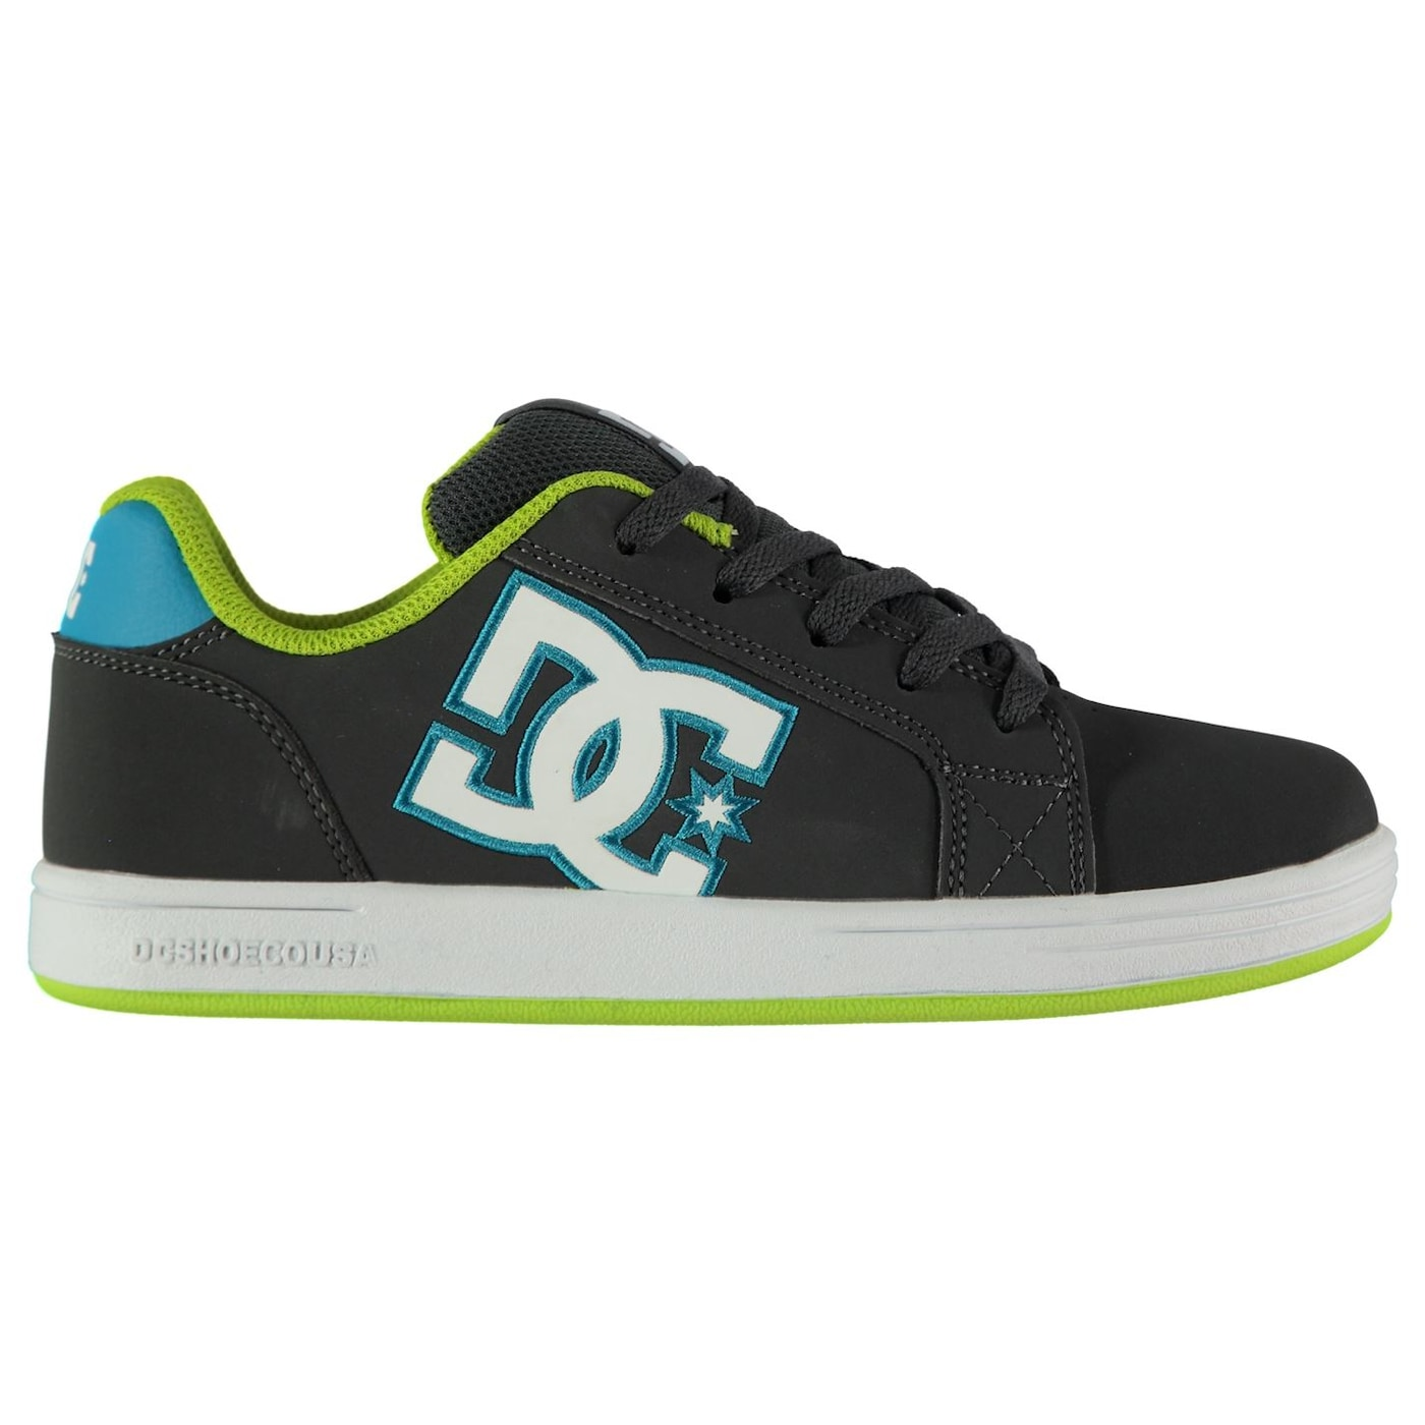 Nike Isolate Junior Skate Shoes